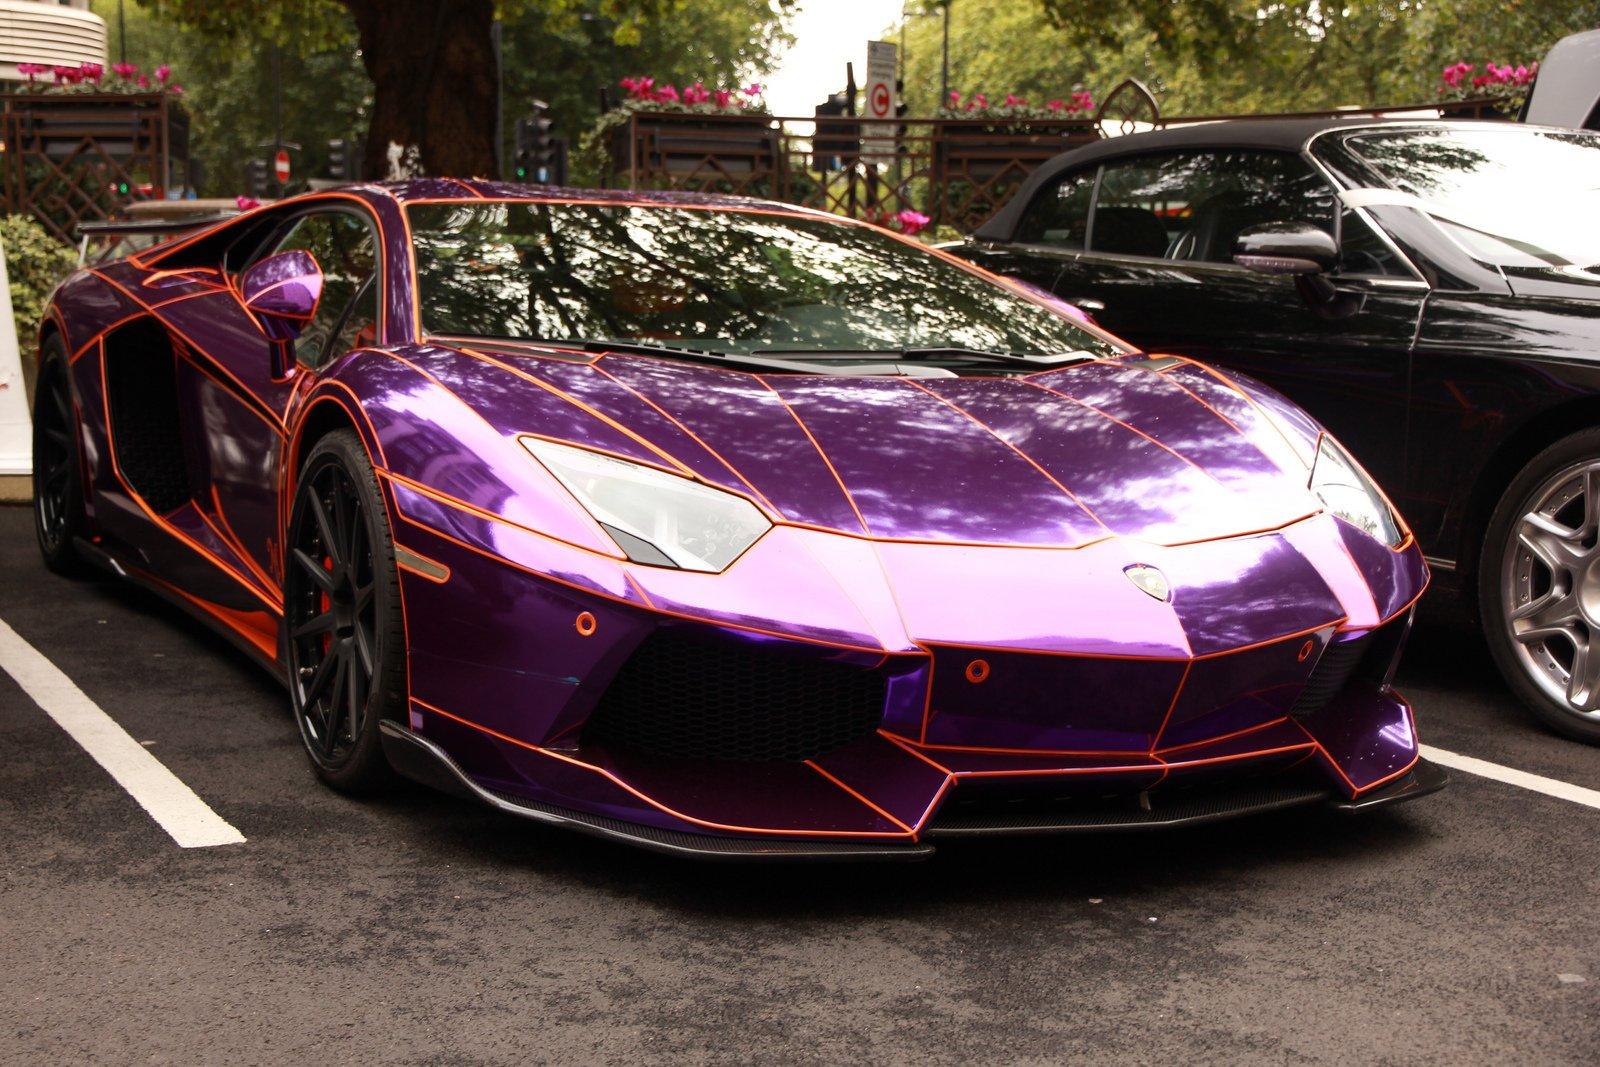 Aventador purple Chrome Lamborghini lp700 supercars Tuning ...